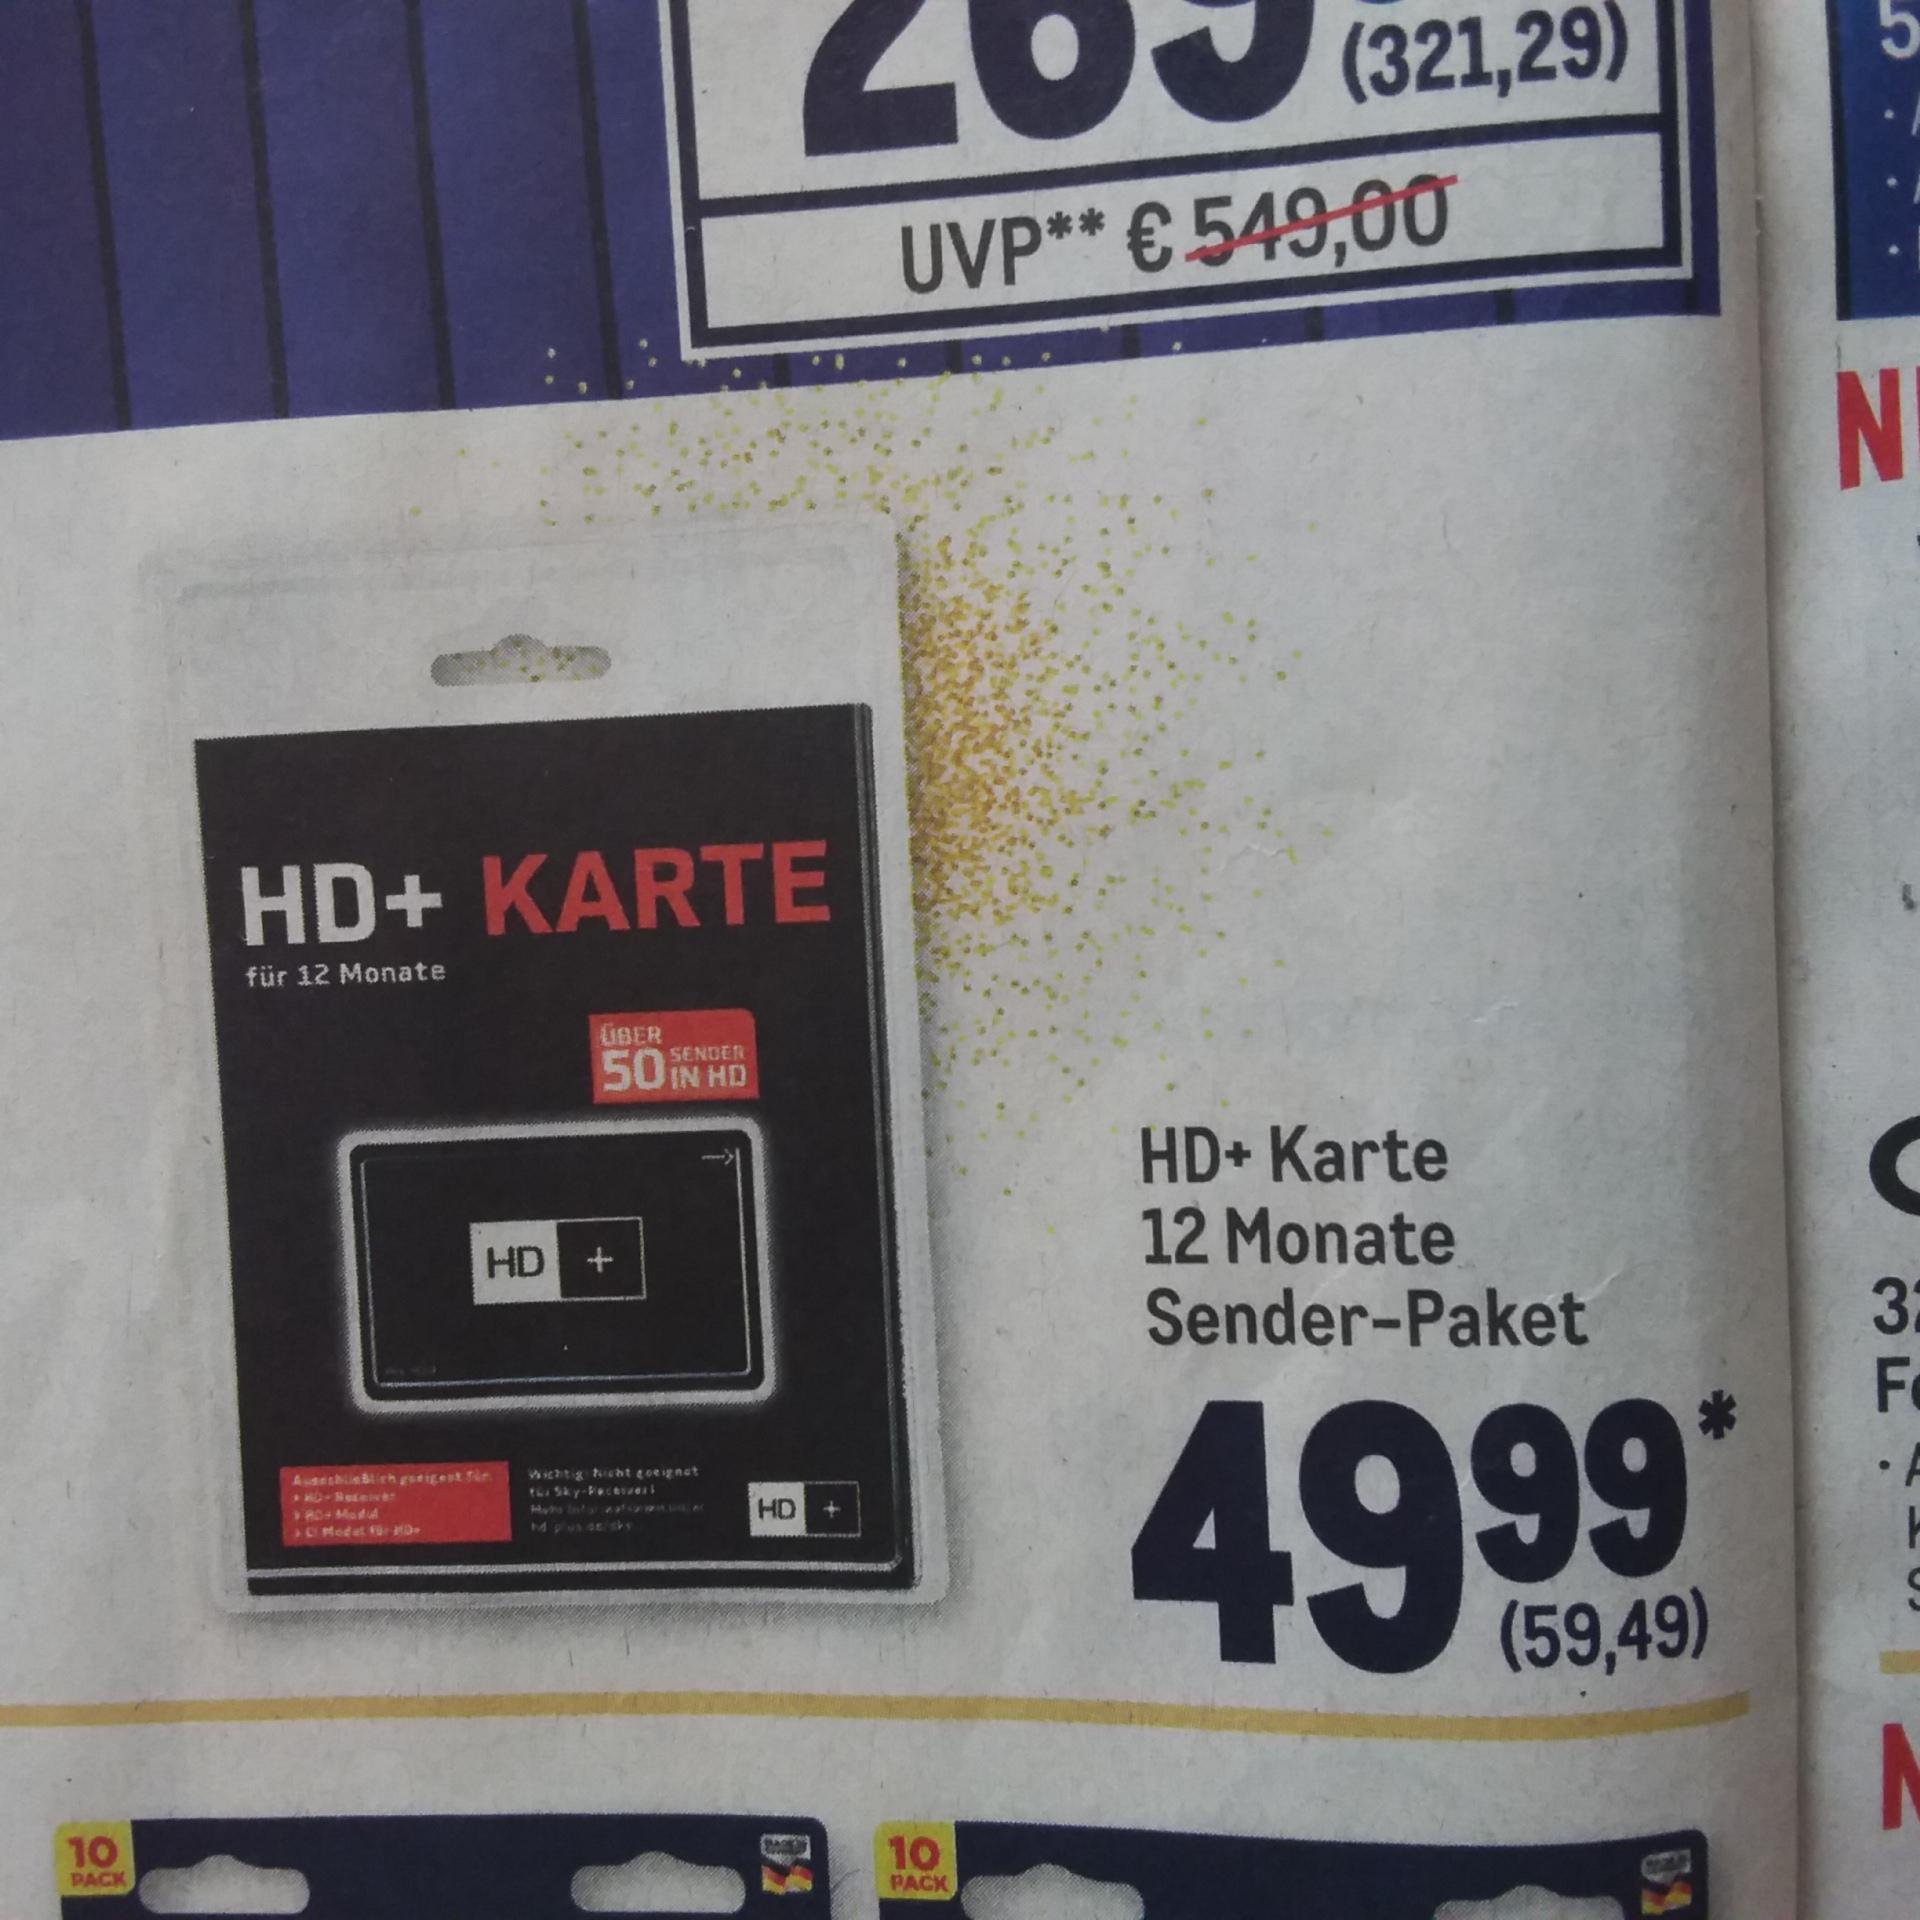 HD + Plus Karte 12 Monate [Metro]